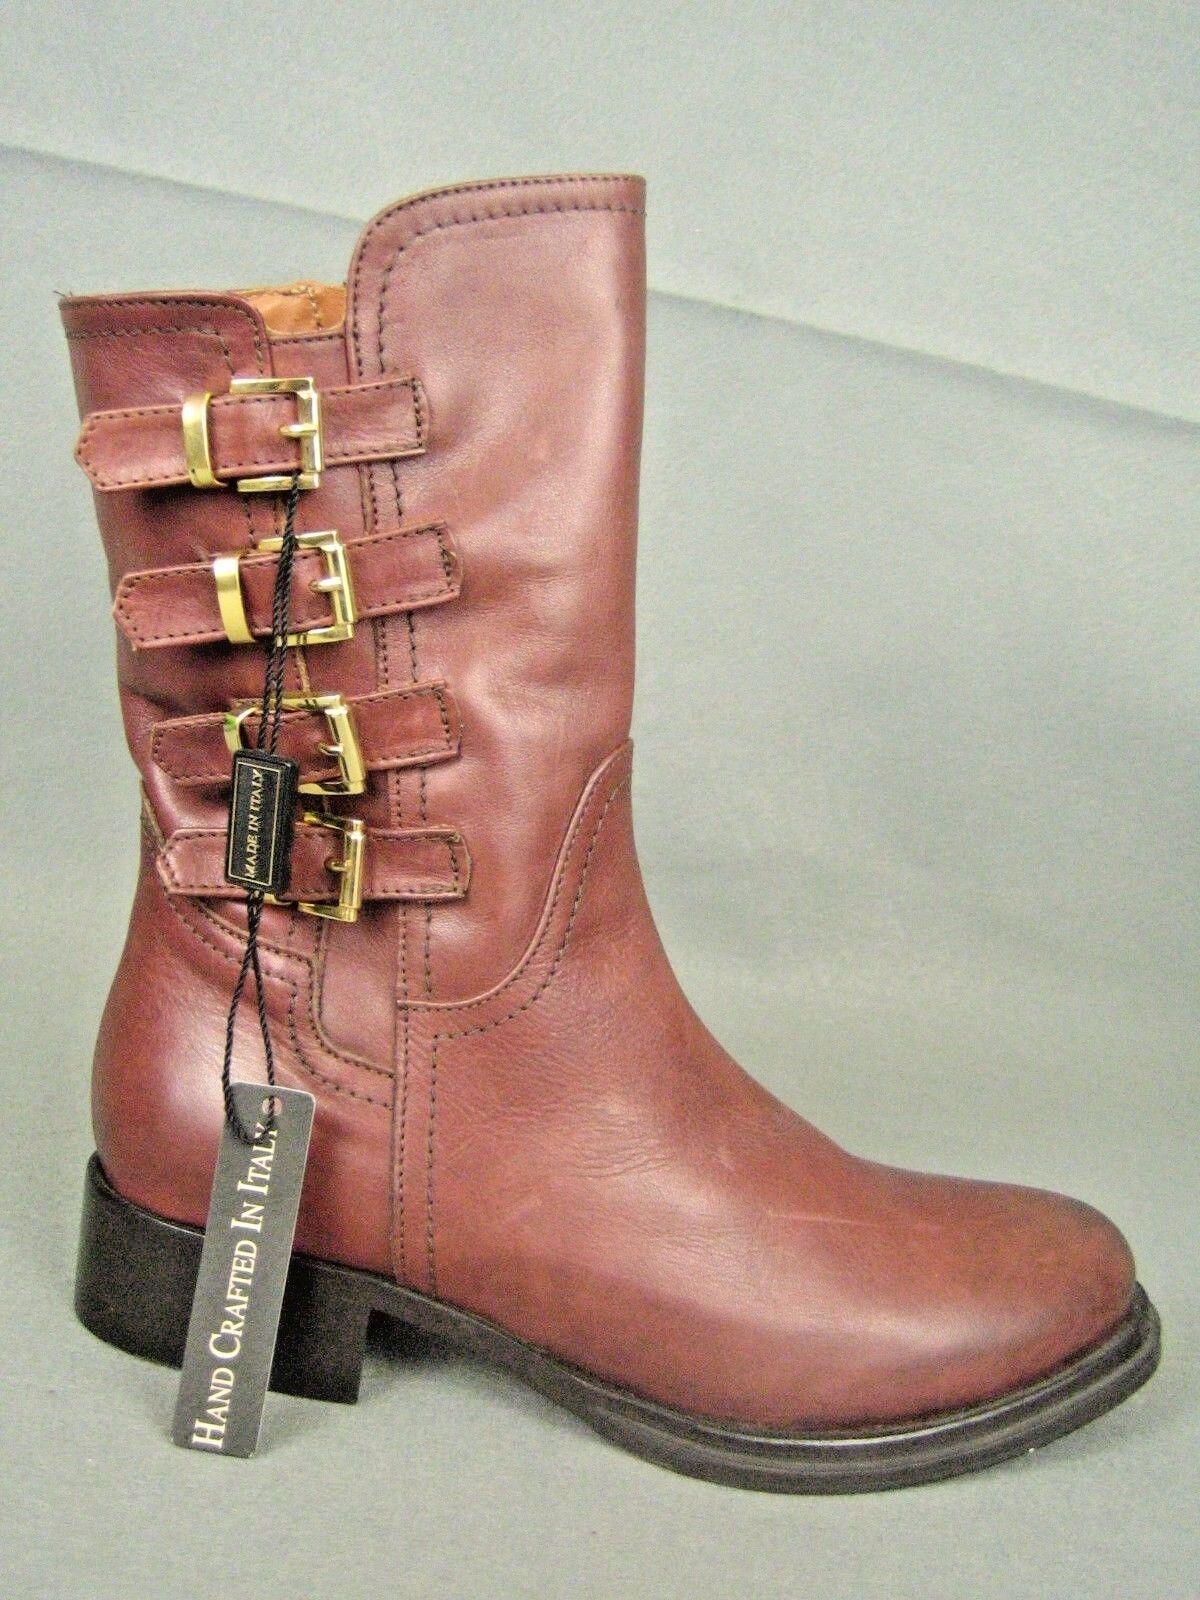 NAPOLEONI ITALY Brown Leather NEW Mid-Calf Moto Boots 36 (6/6.5)